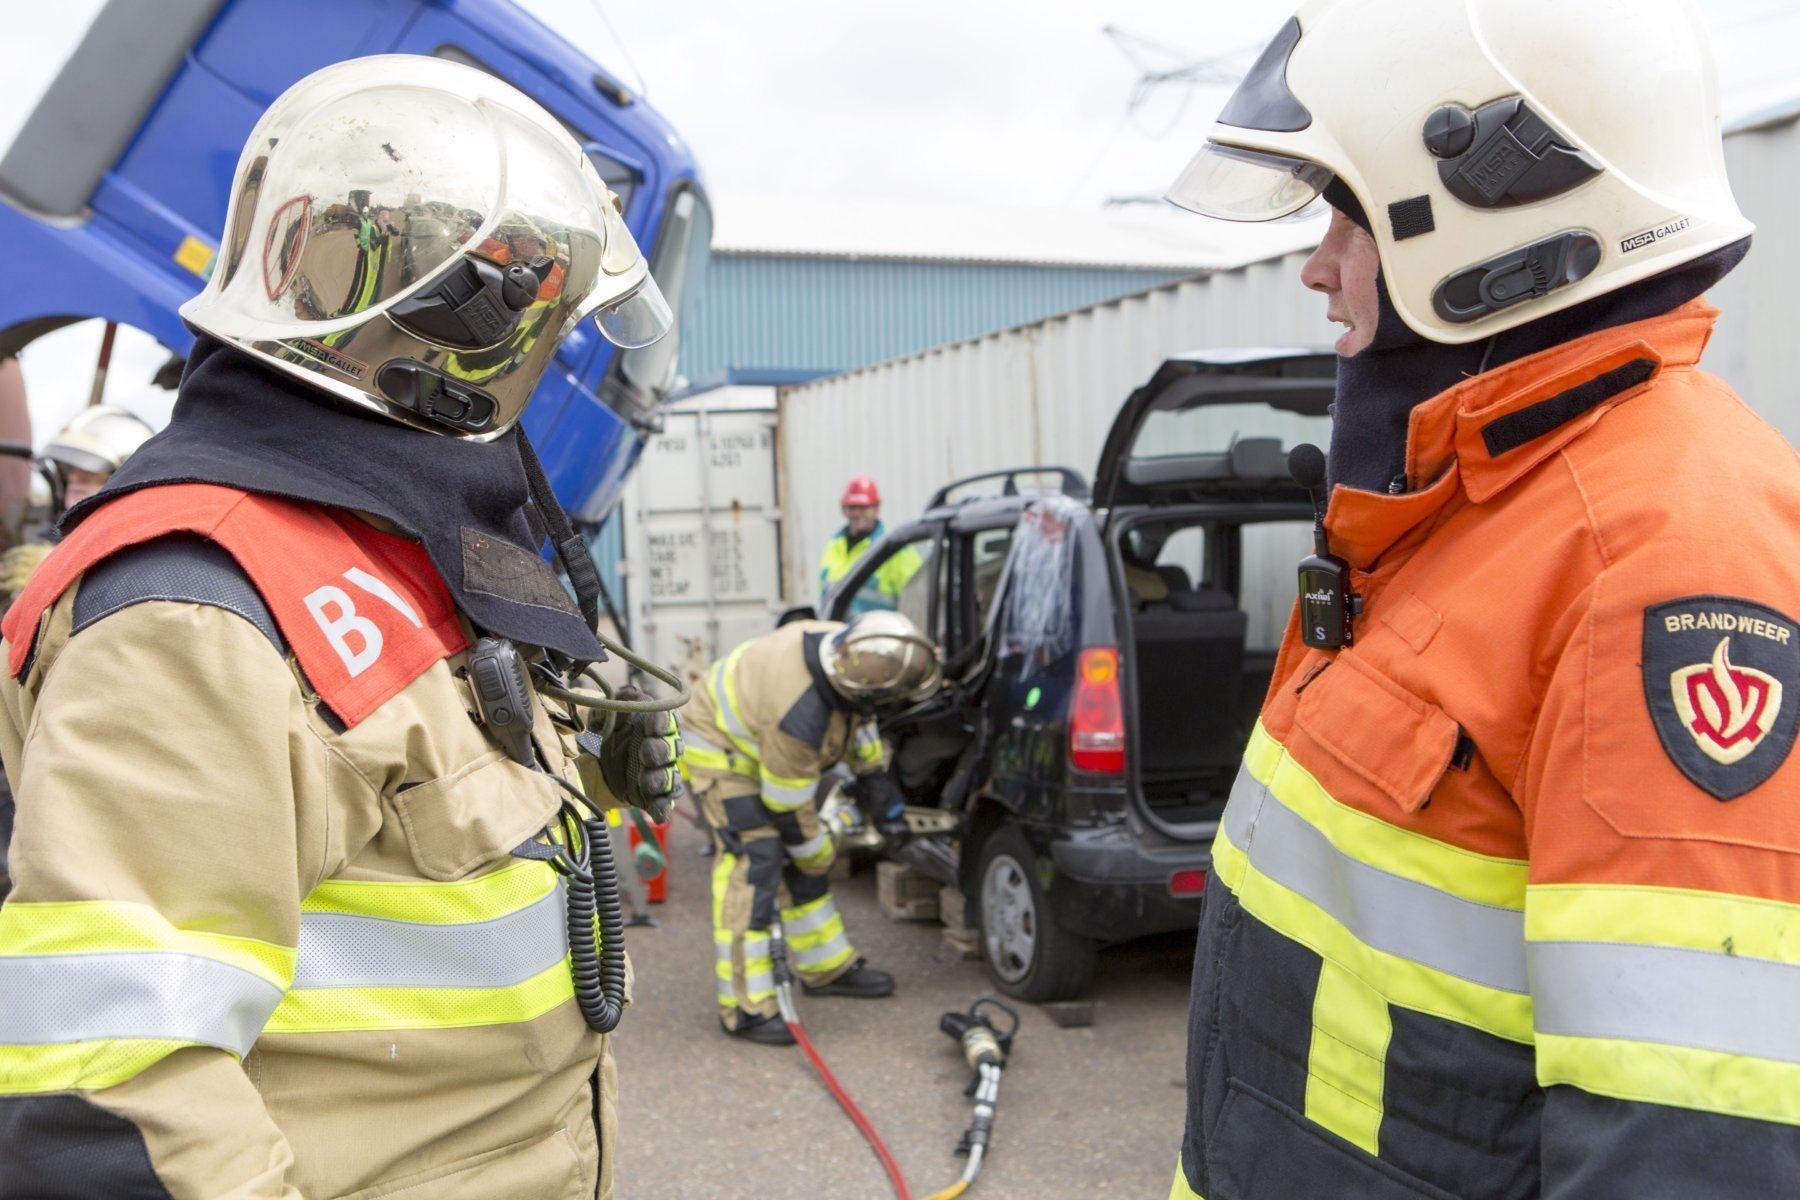 axitour-axiwi-communicatie-systeem-veiligheidsregio-gelderland-zuid-oefening